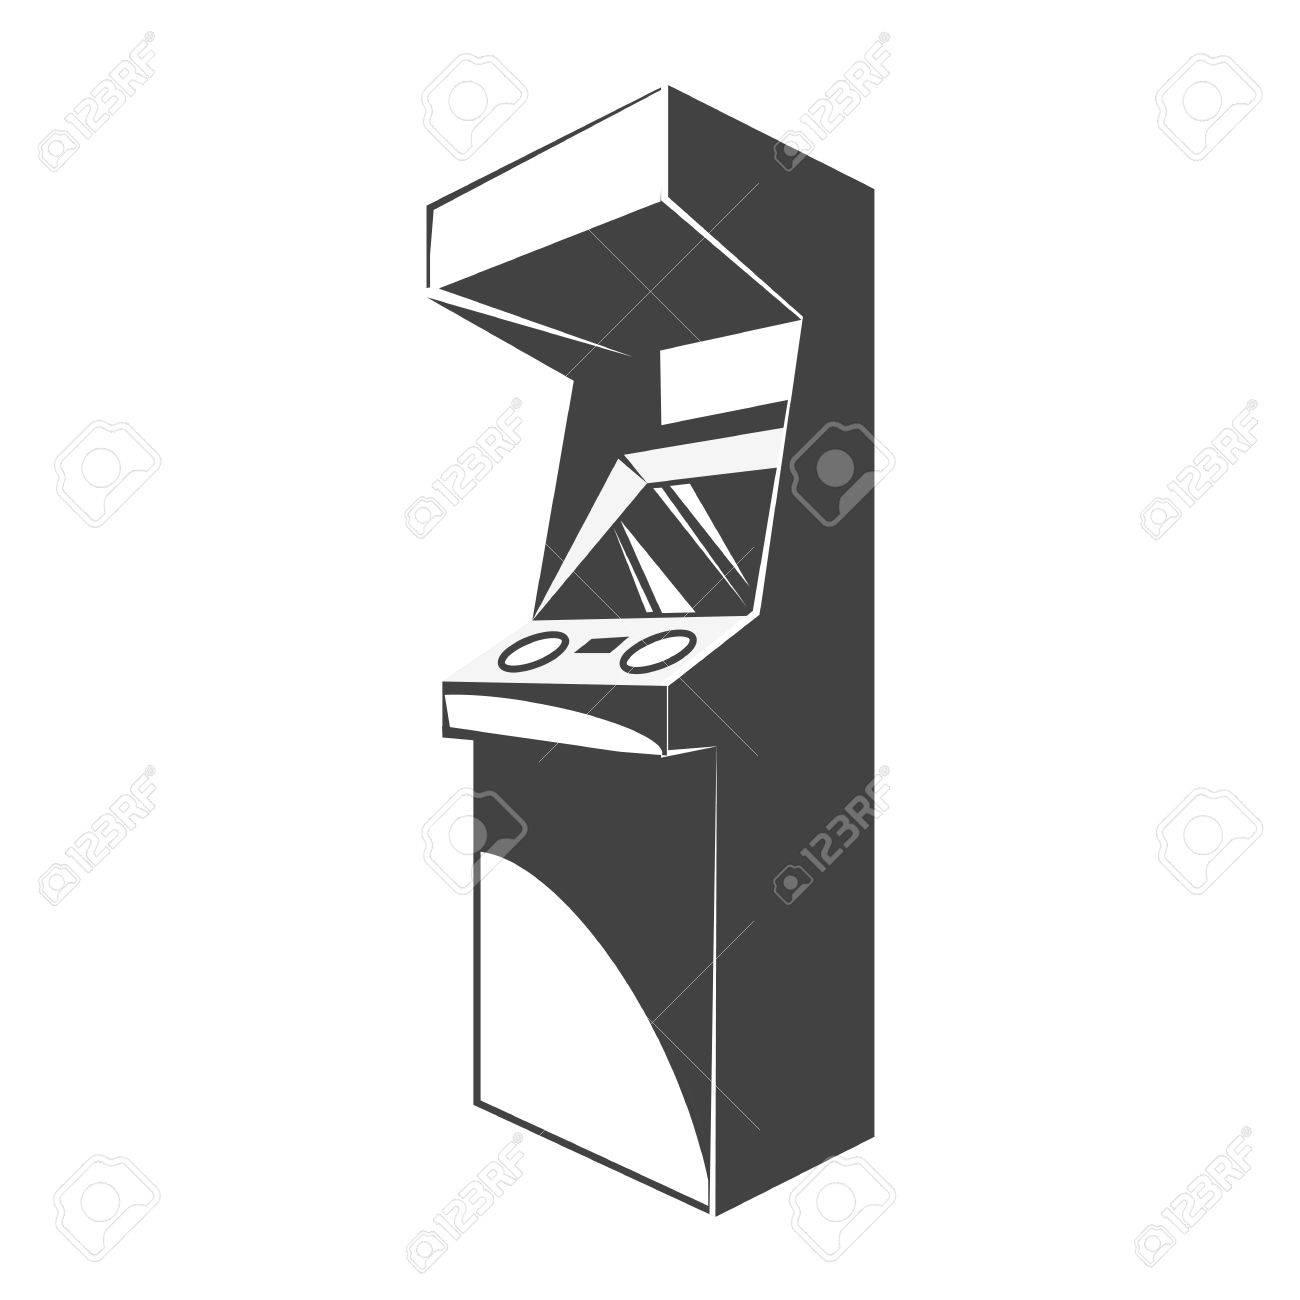 Retro Arcade Video Game Machine. Gaming Machine Icon. Vector ...